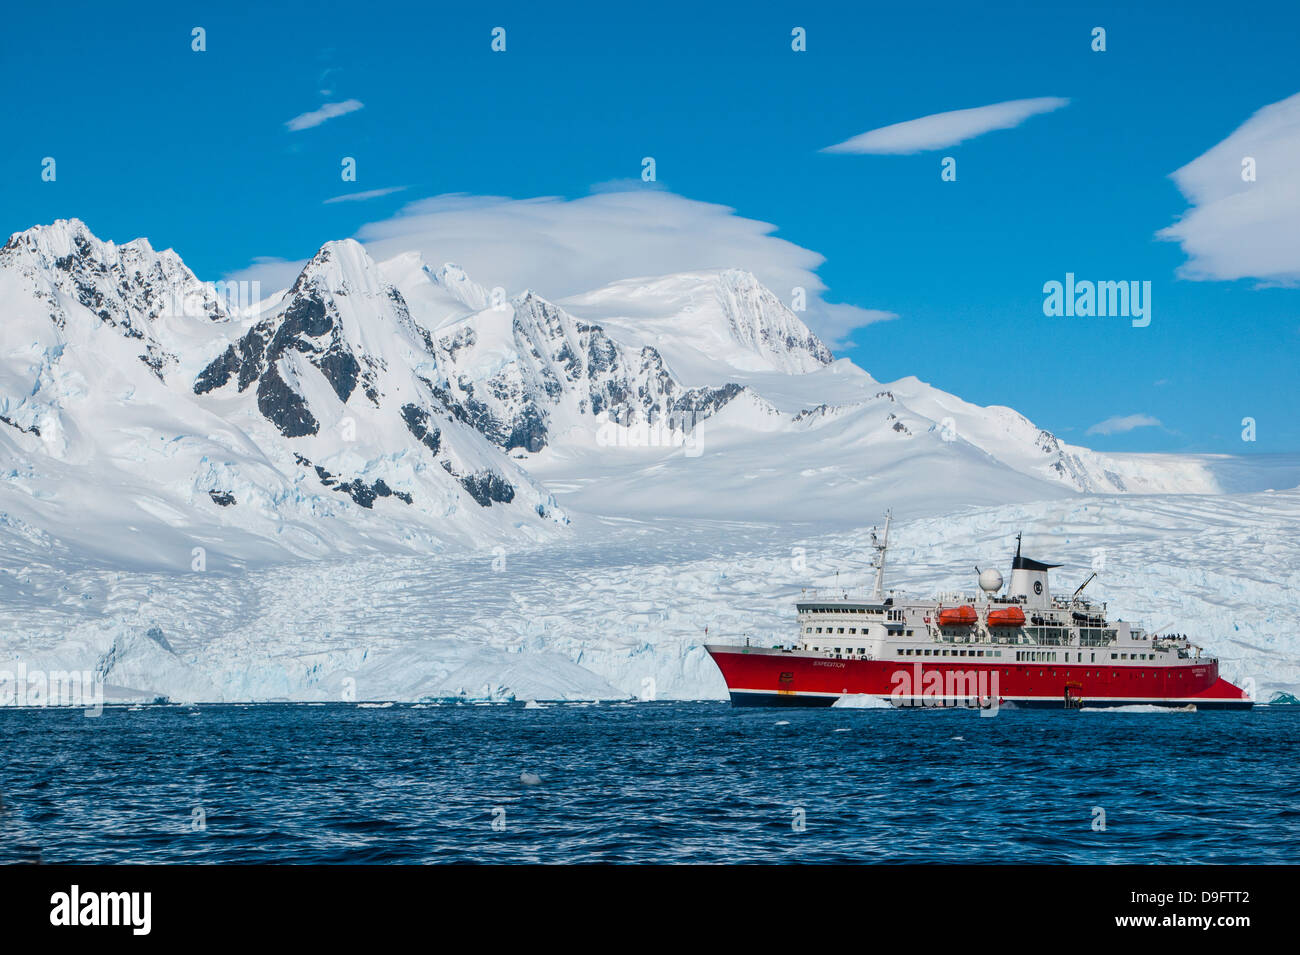 Cruise ship in front of the glaciers of Cierva Cove, Antarctica, Polar Regions - Stock Image